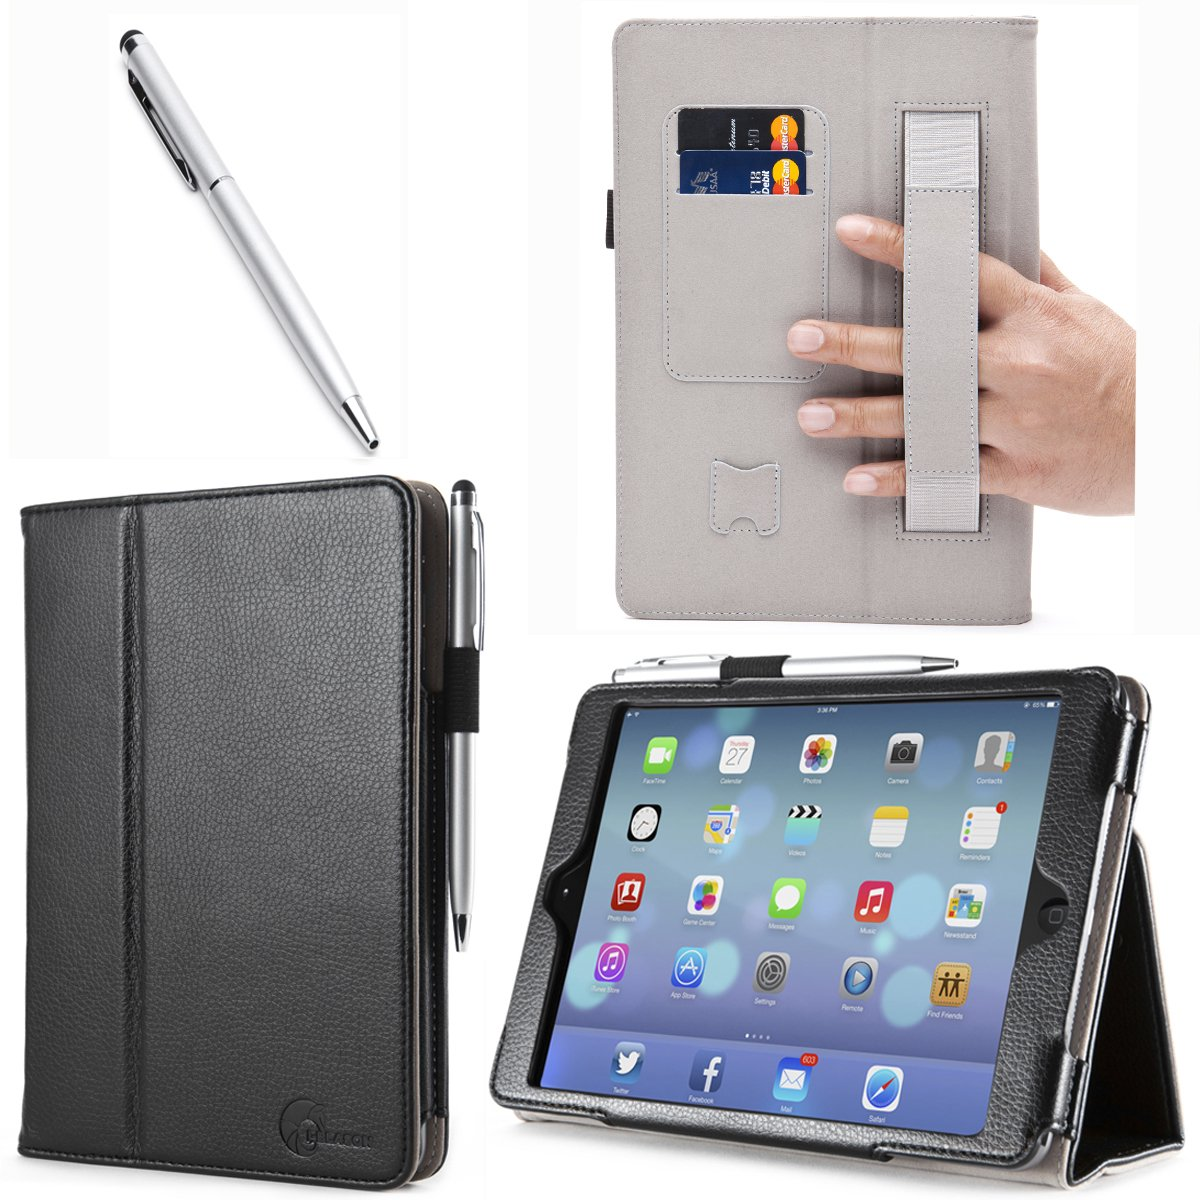 Amazon.com: iPad Mini Case, i-Blason Apple iPad Mini 3 Case [2014 ...